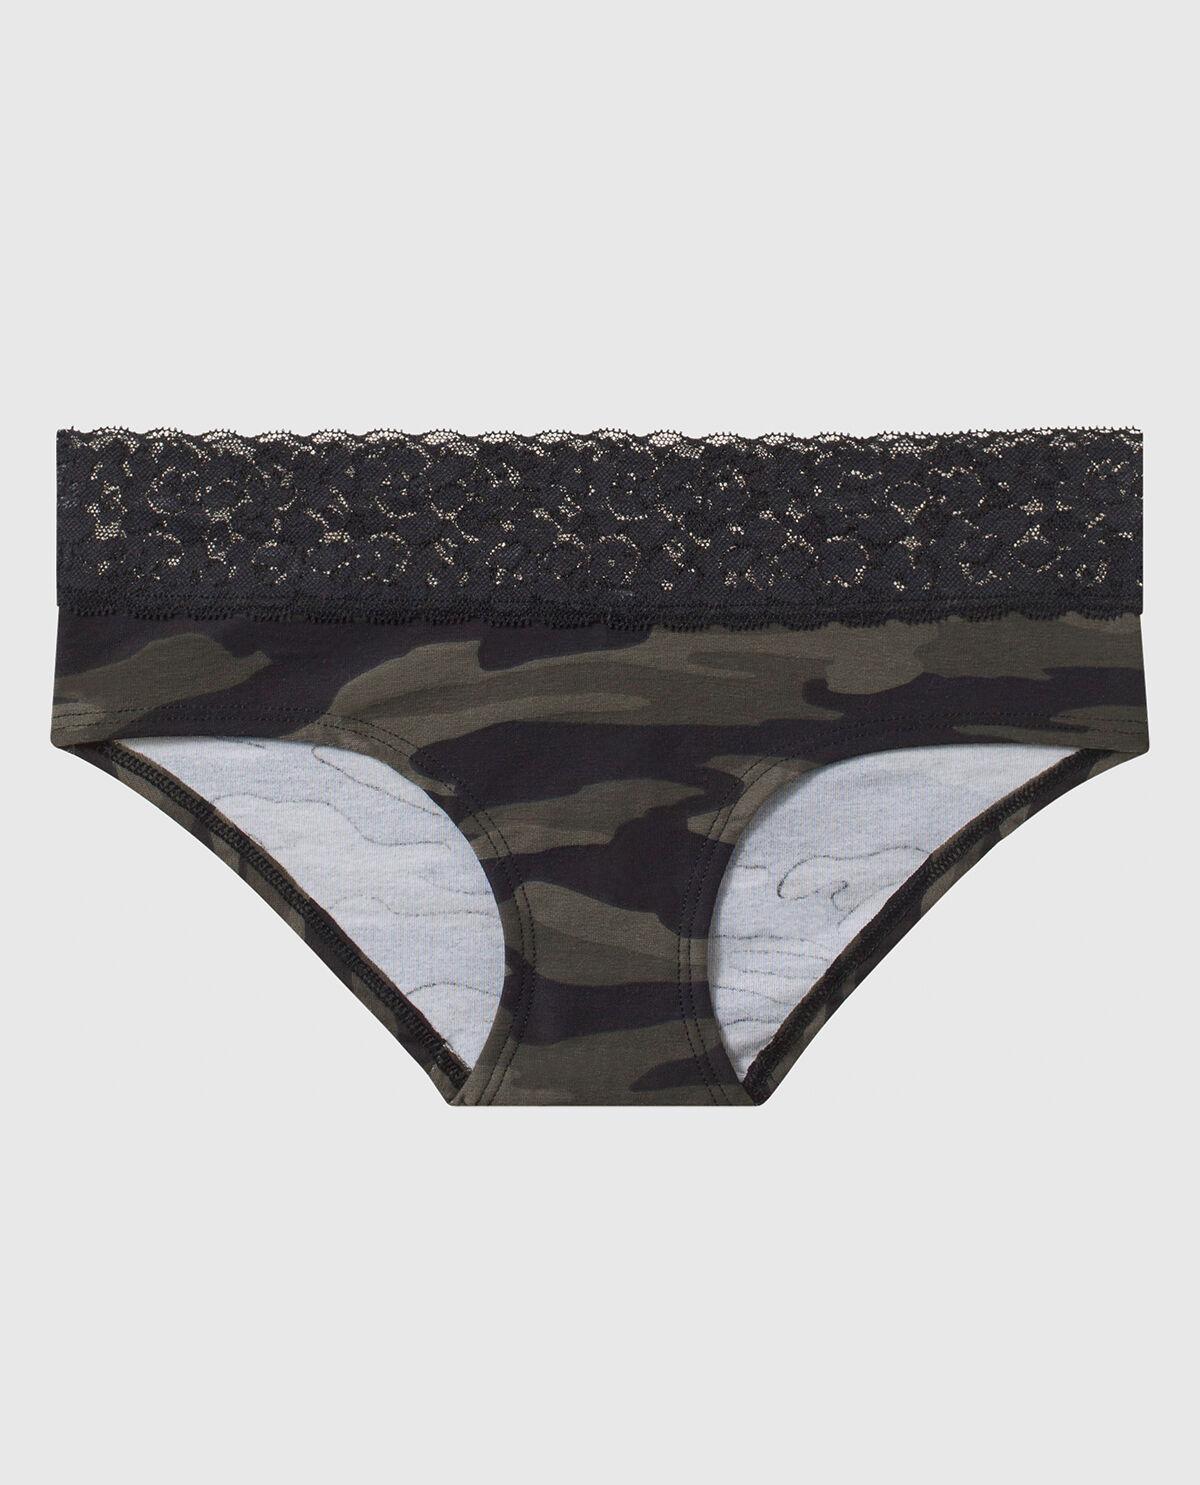 Zebra Lace Hipster Boyshort Panty Pink or Black